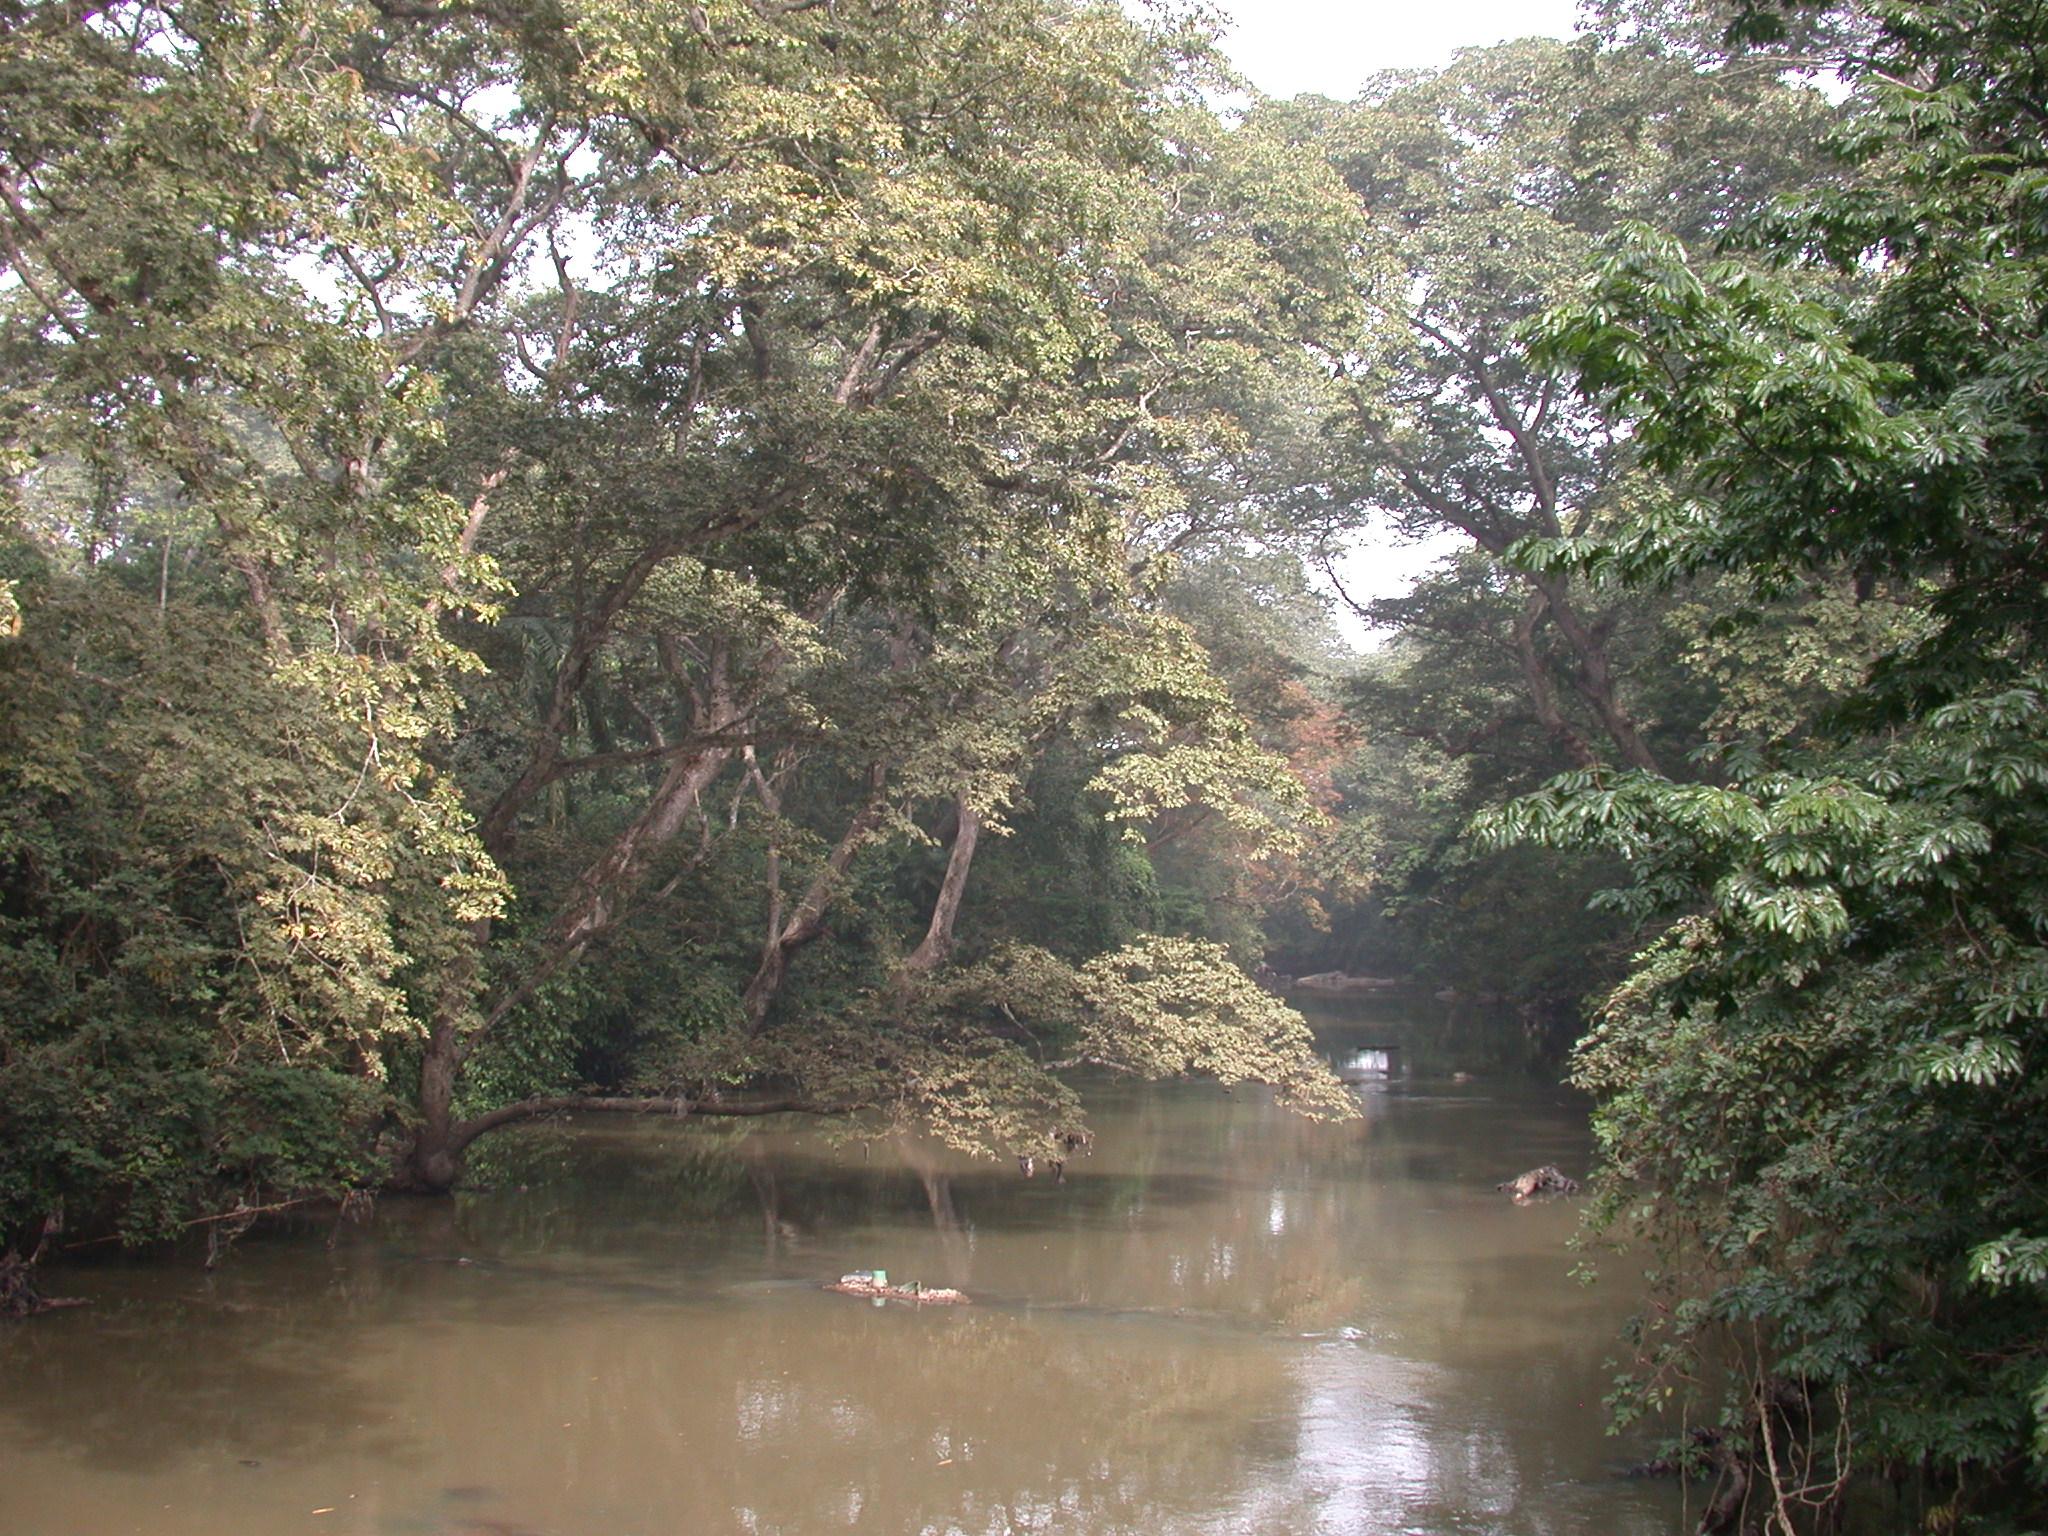 Lush Vegetation by Osun River, Osun Sacred Grove, Oshogbo, Nigeria